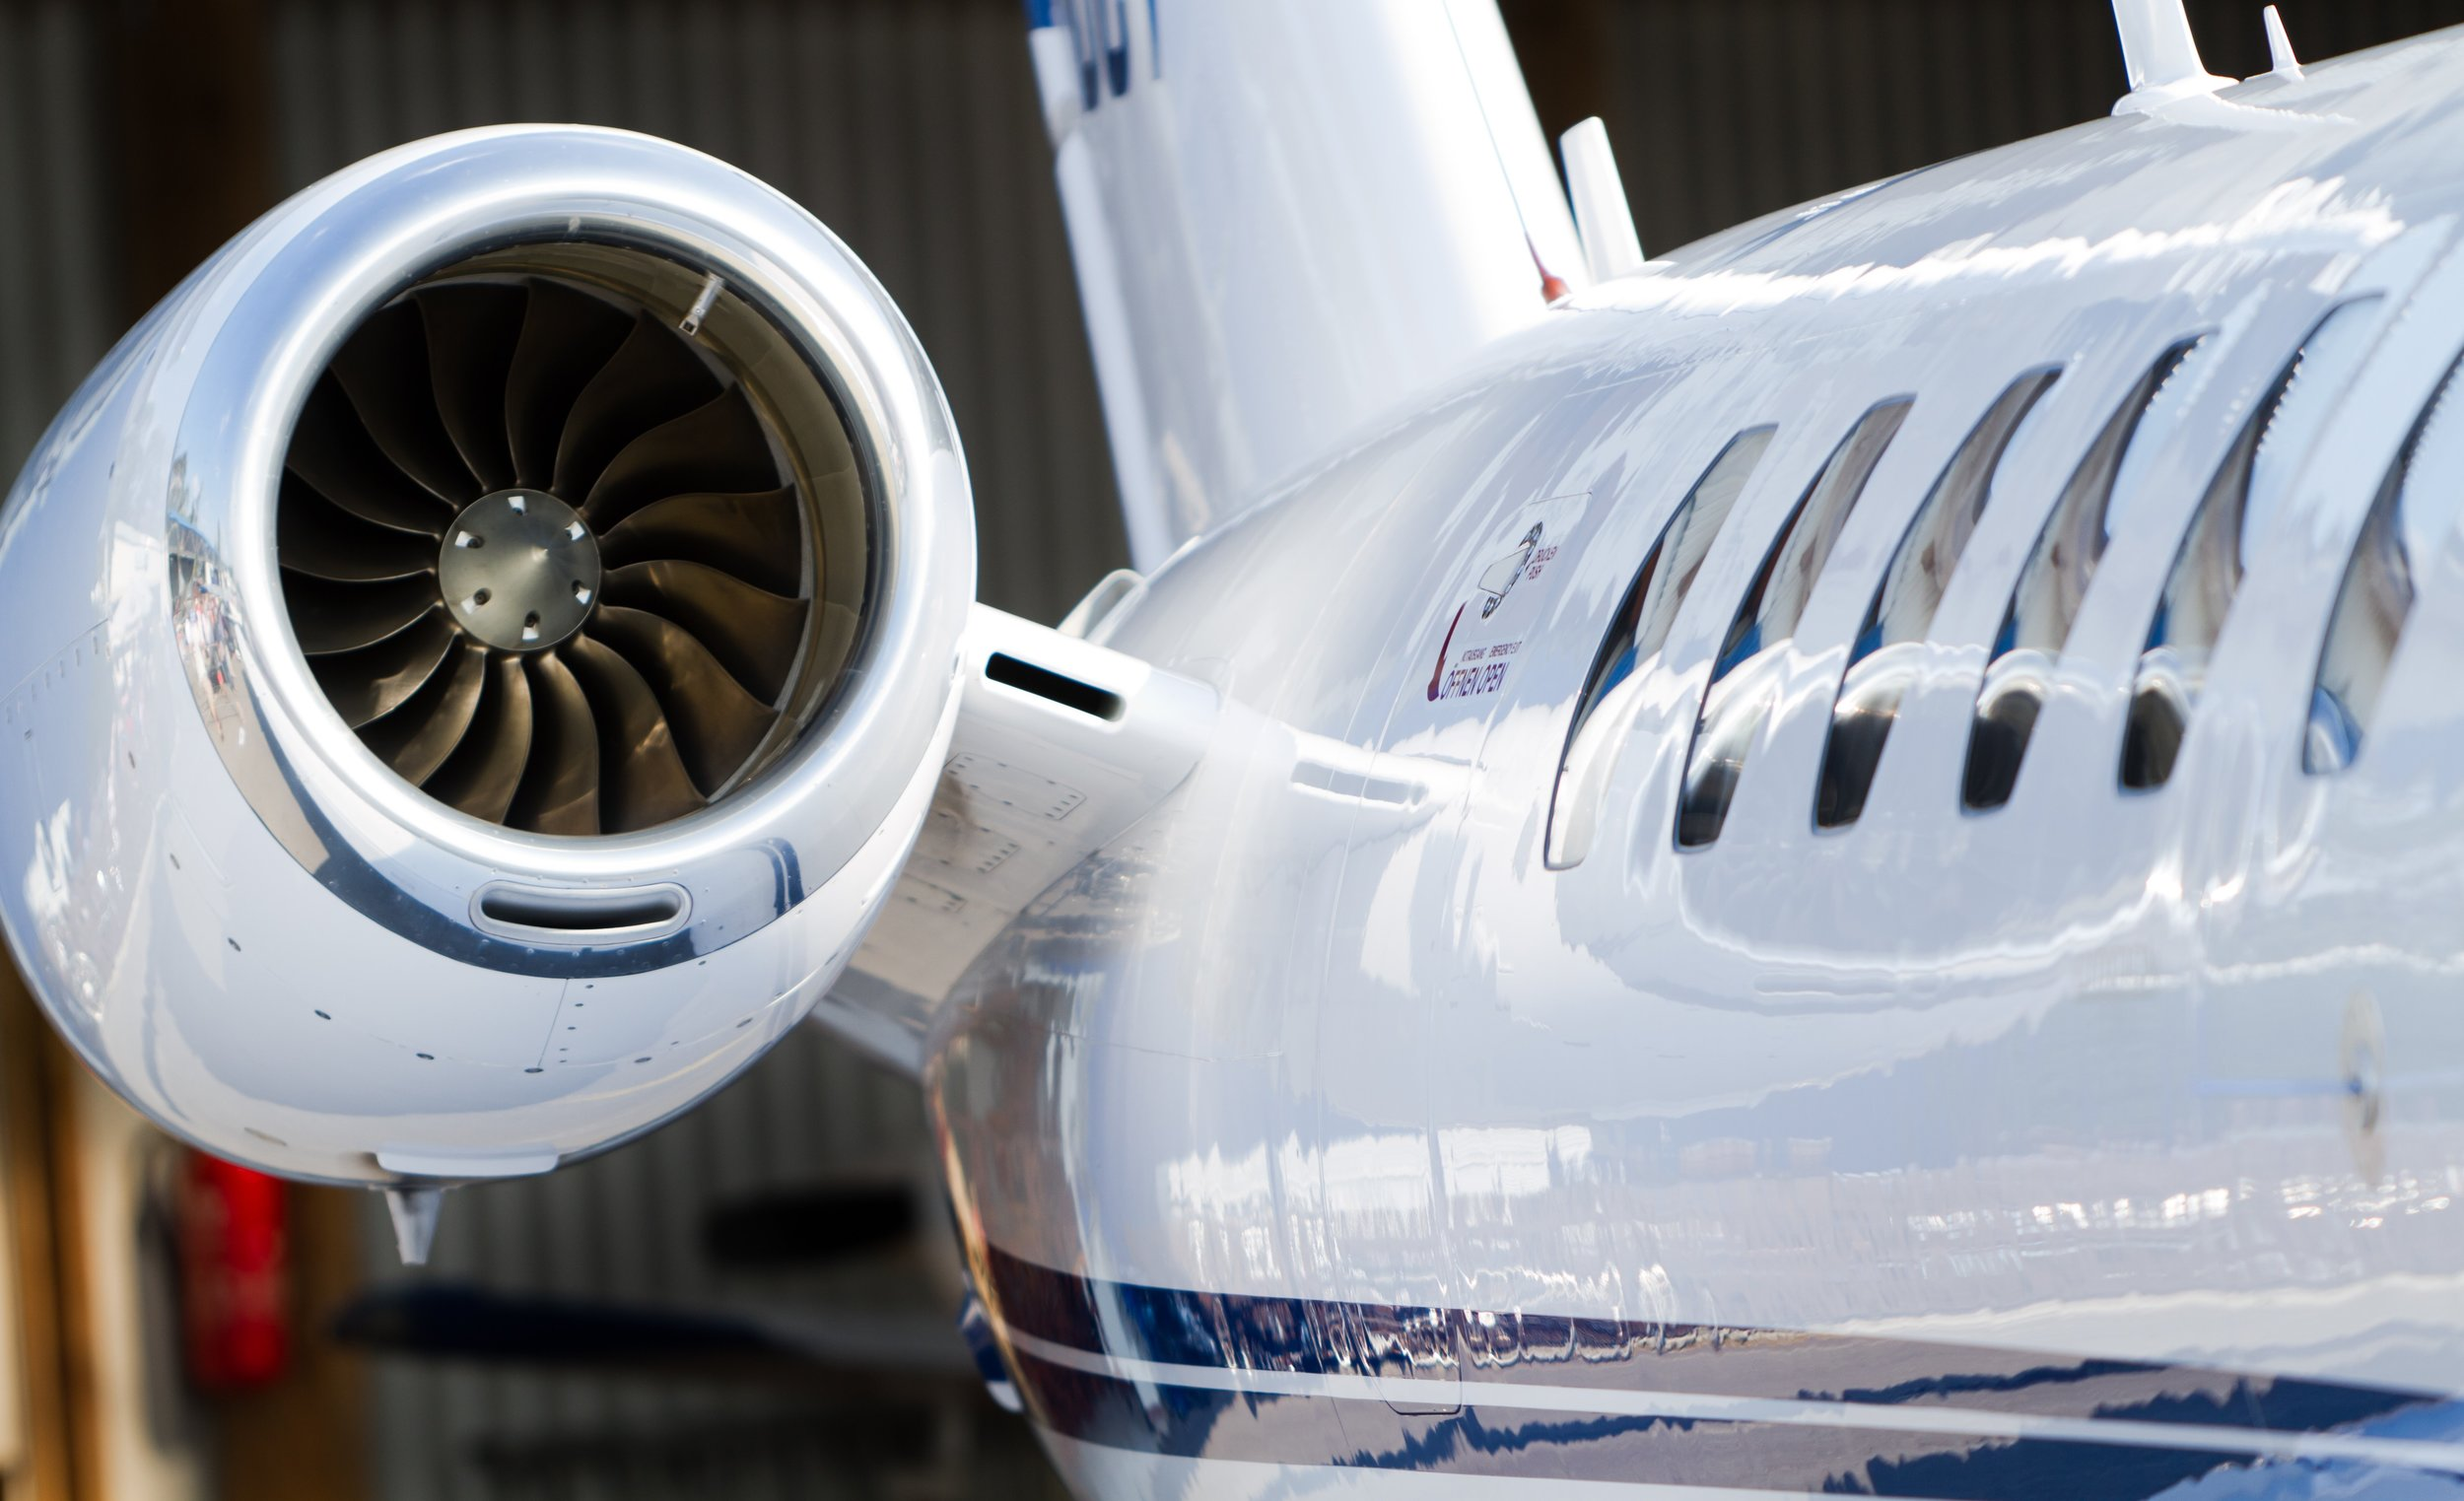 Corporate-Jet-Getty-182923994.jpg